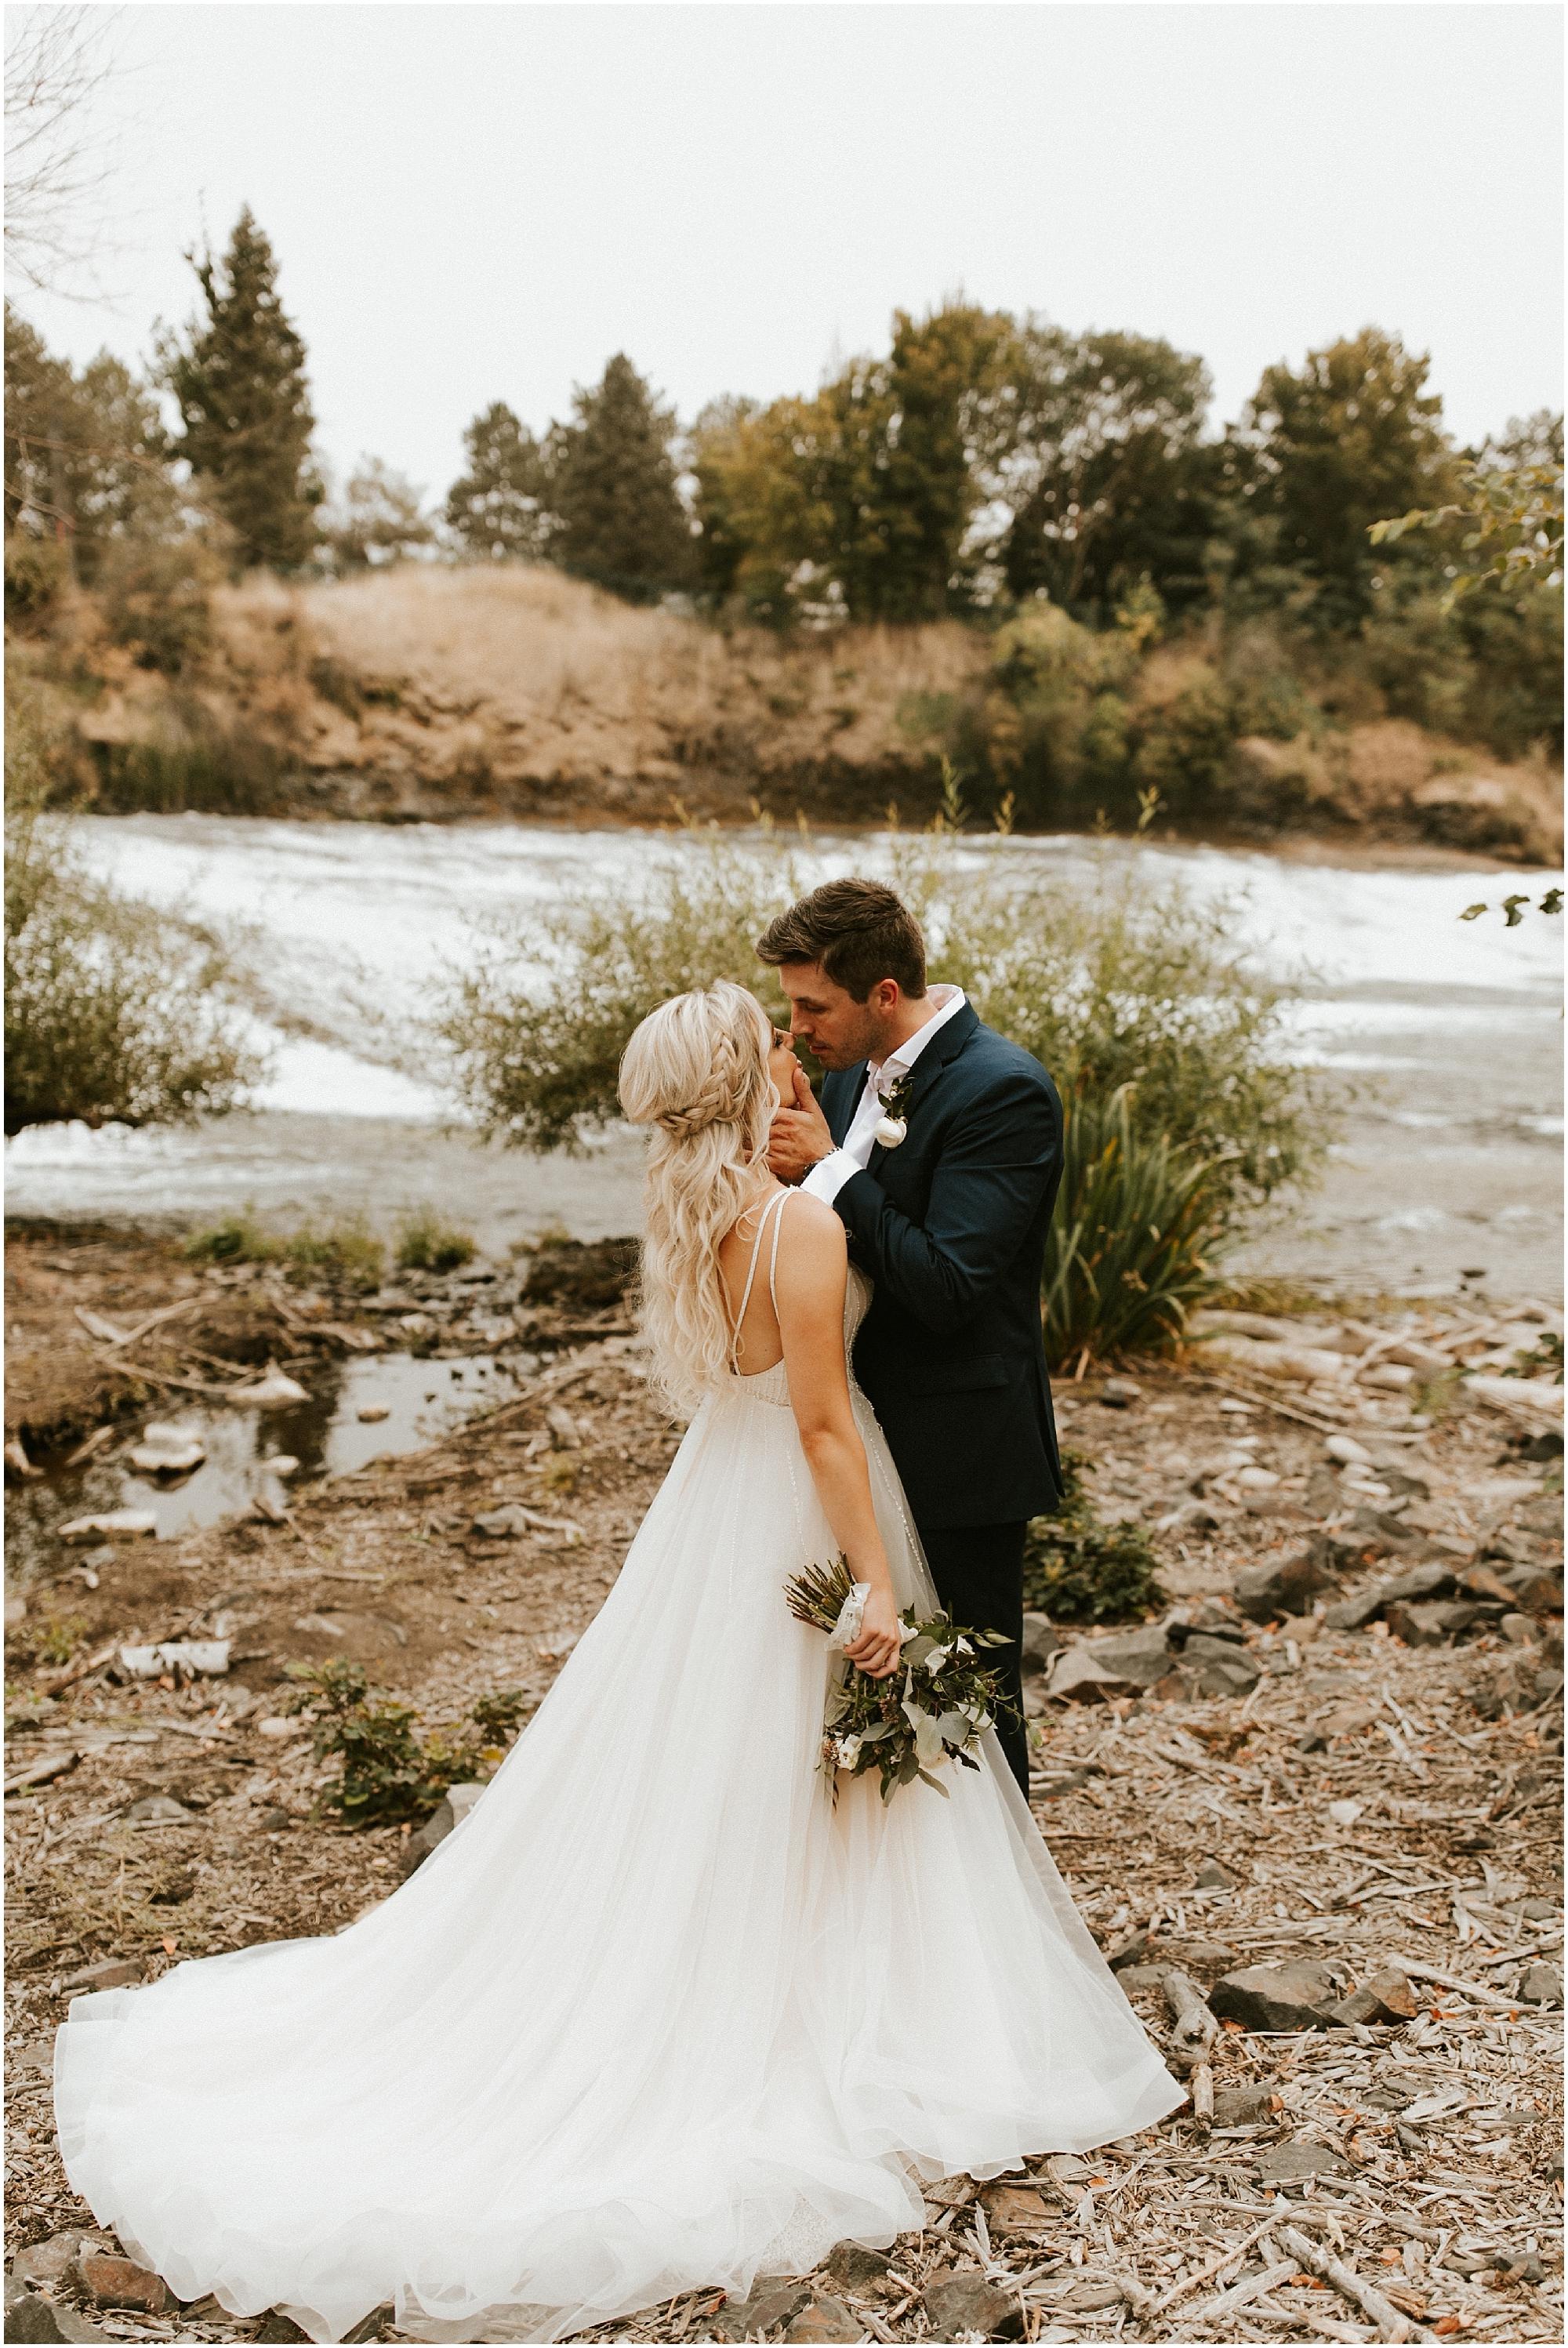 Chateau Rive Spokane Wedding Cassie Trottier Photography1099.jpg